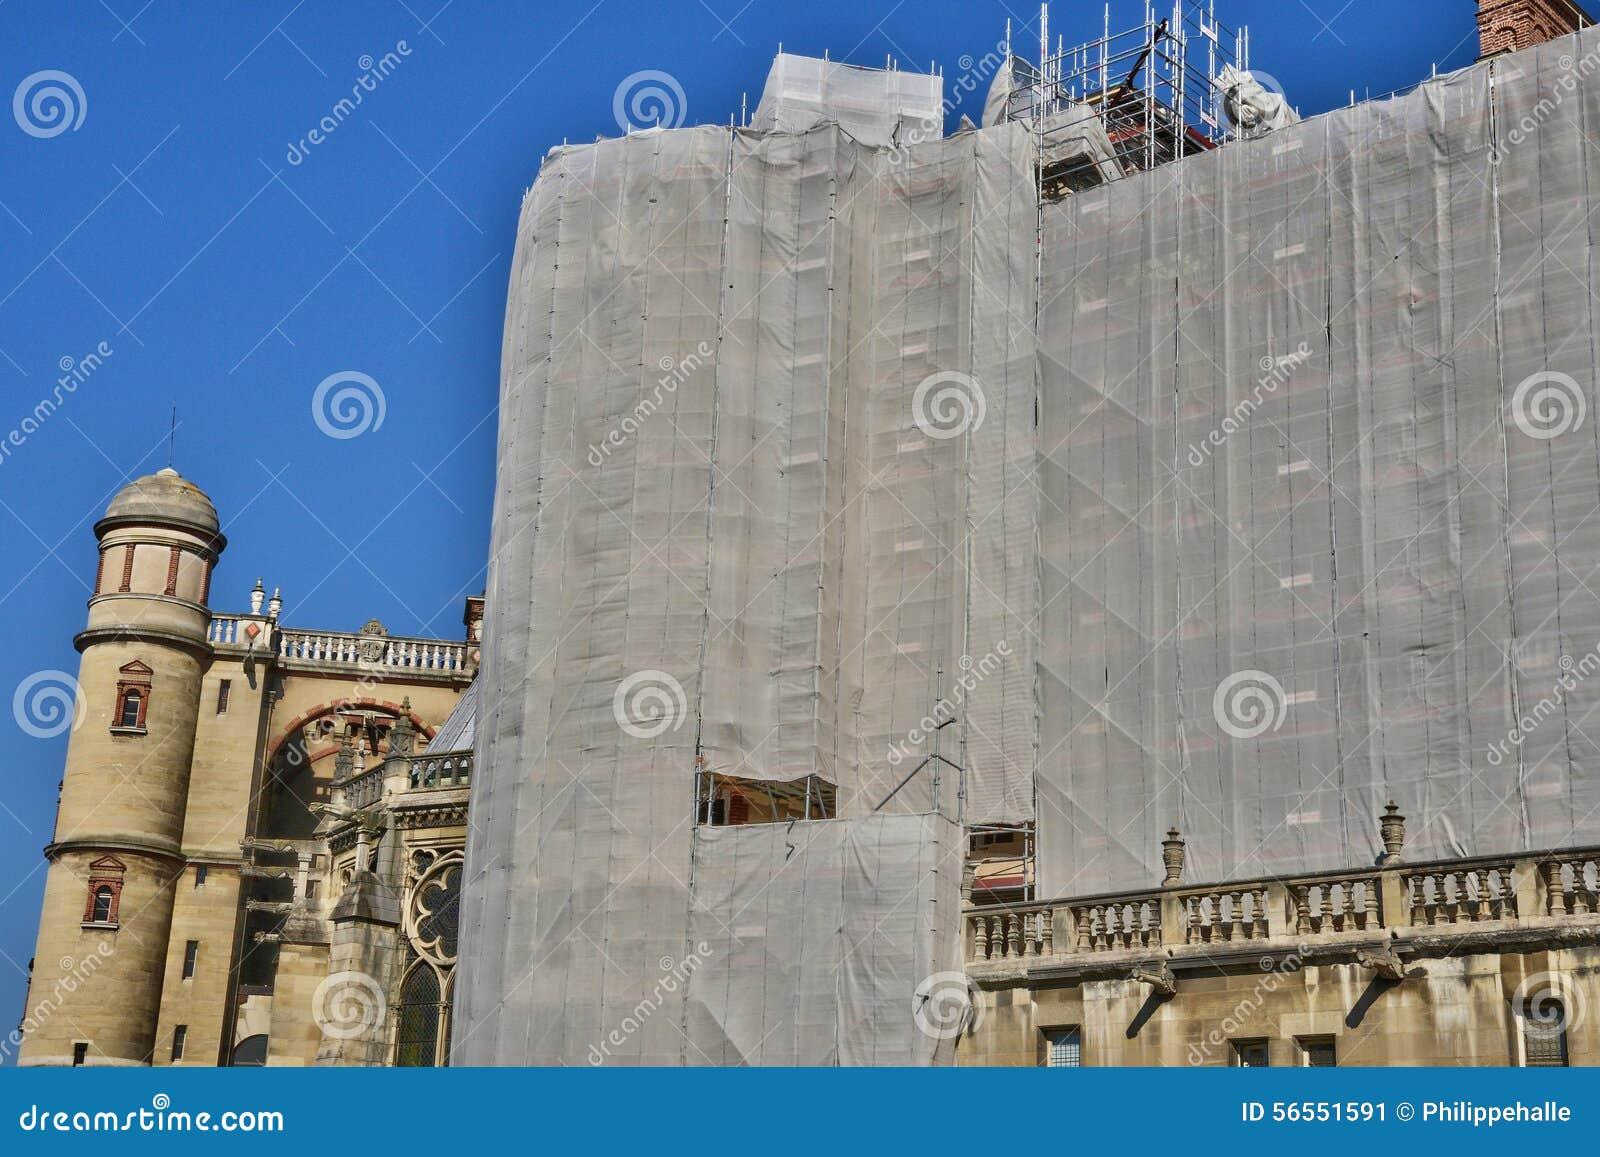 Download Γαλλία, το γραφικό κάστρο Αγίου Ζερμαίν EN Laye Εκδοτική Εικόνες - εικόνα από ζερμαίν, αποκατάσταση: 56551591